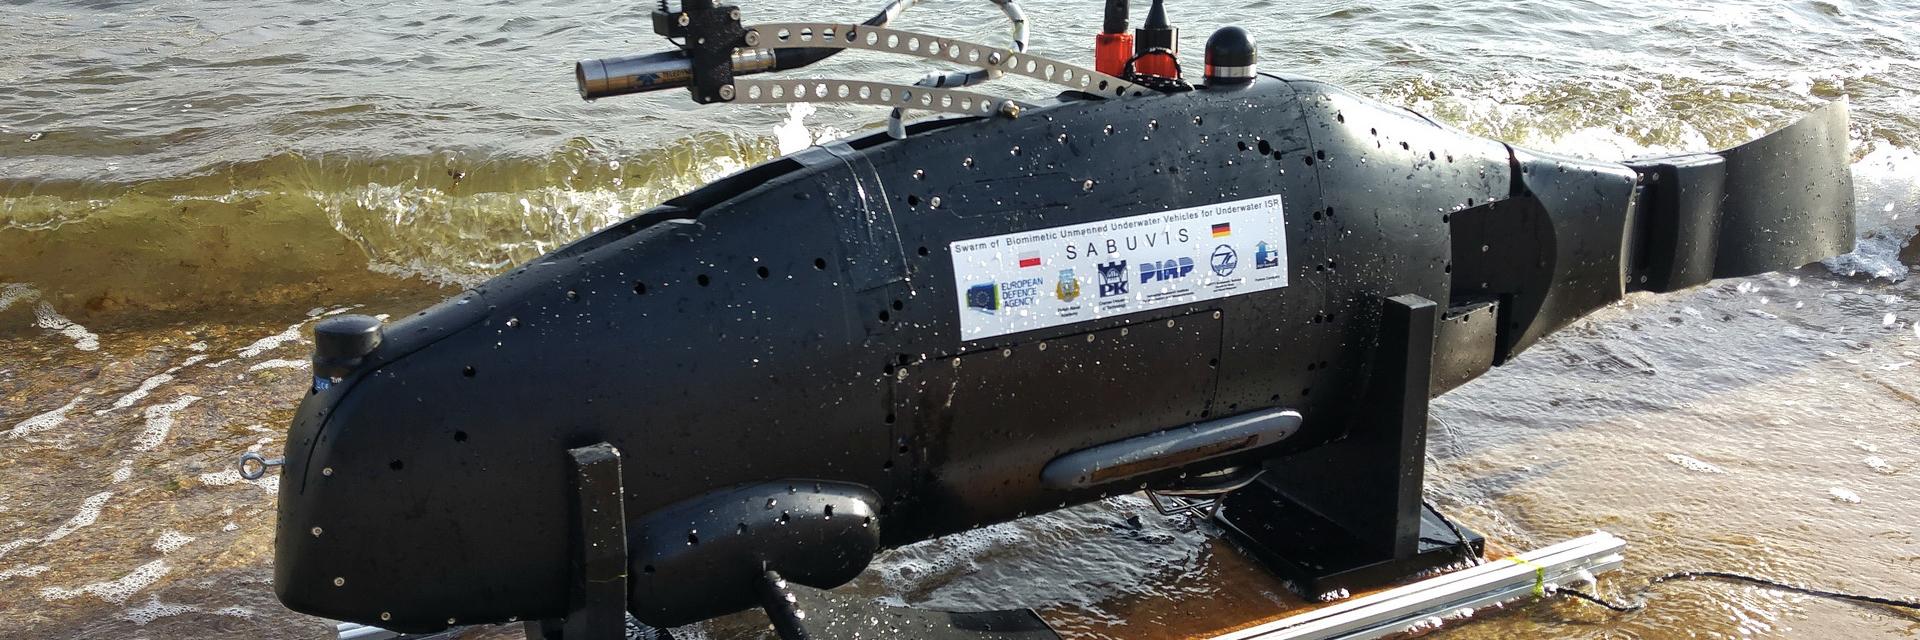 EDA expands work on autonomous underwater vehicles